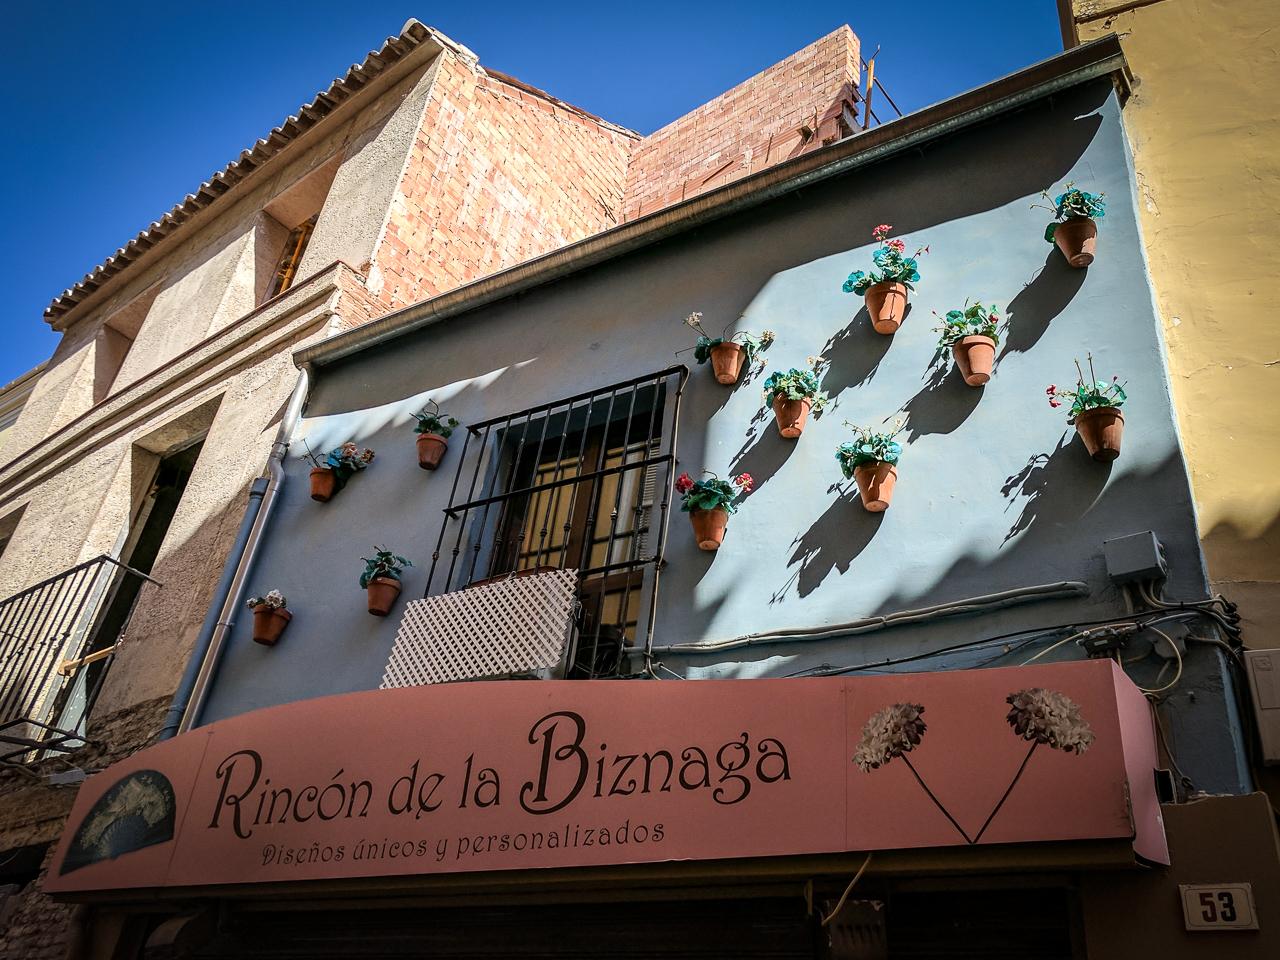 Rincón de la Biznaga